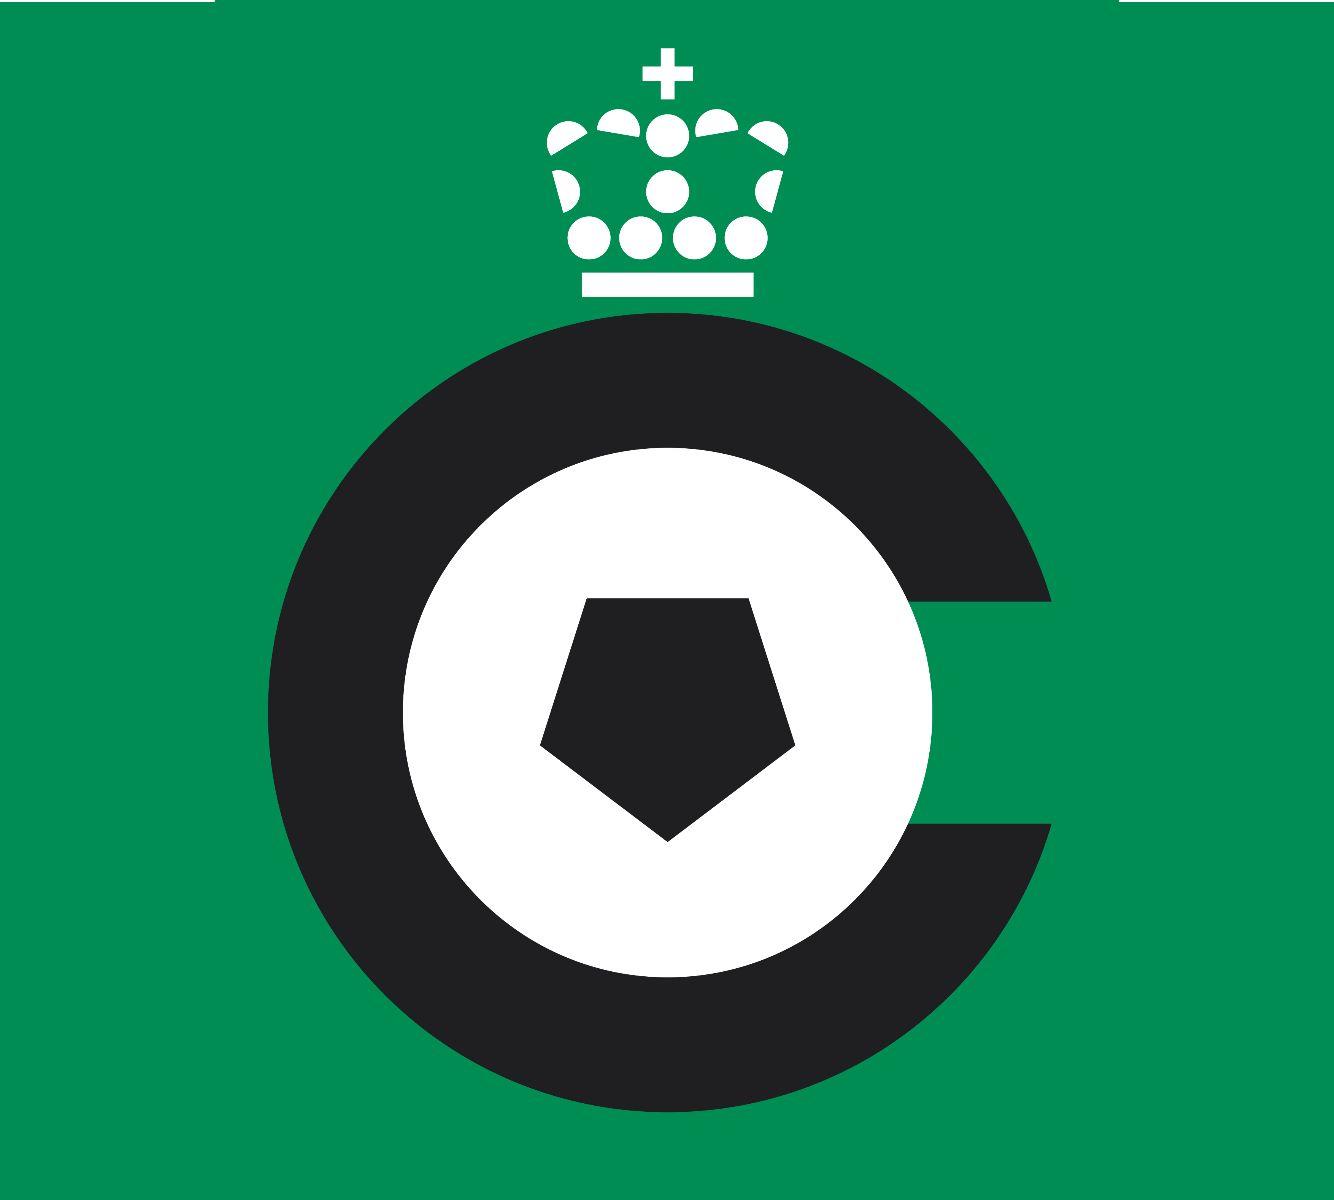 Logo-Cercle.jpg